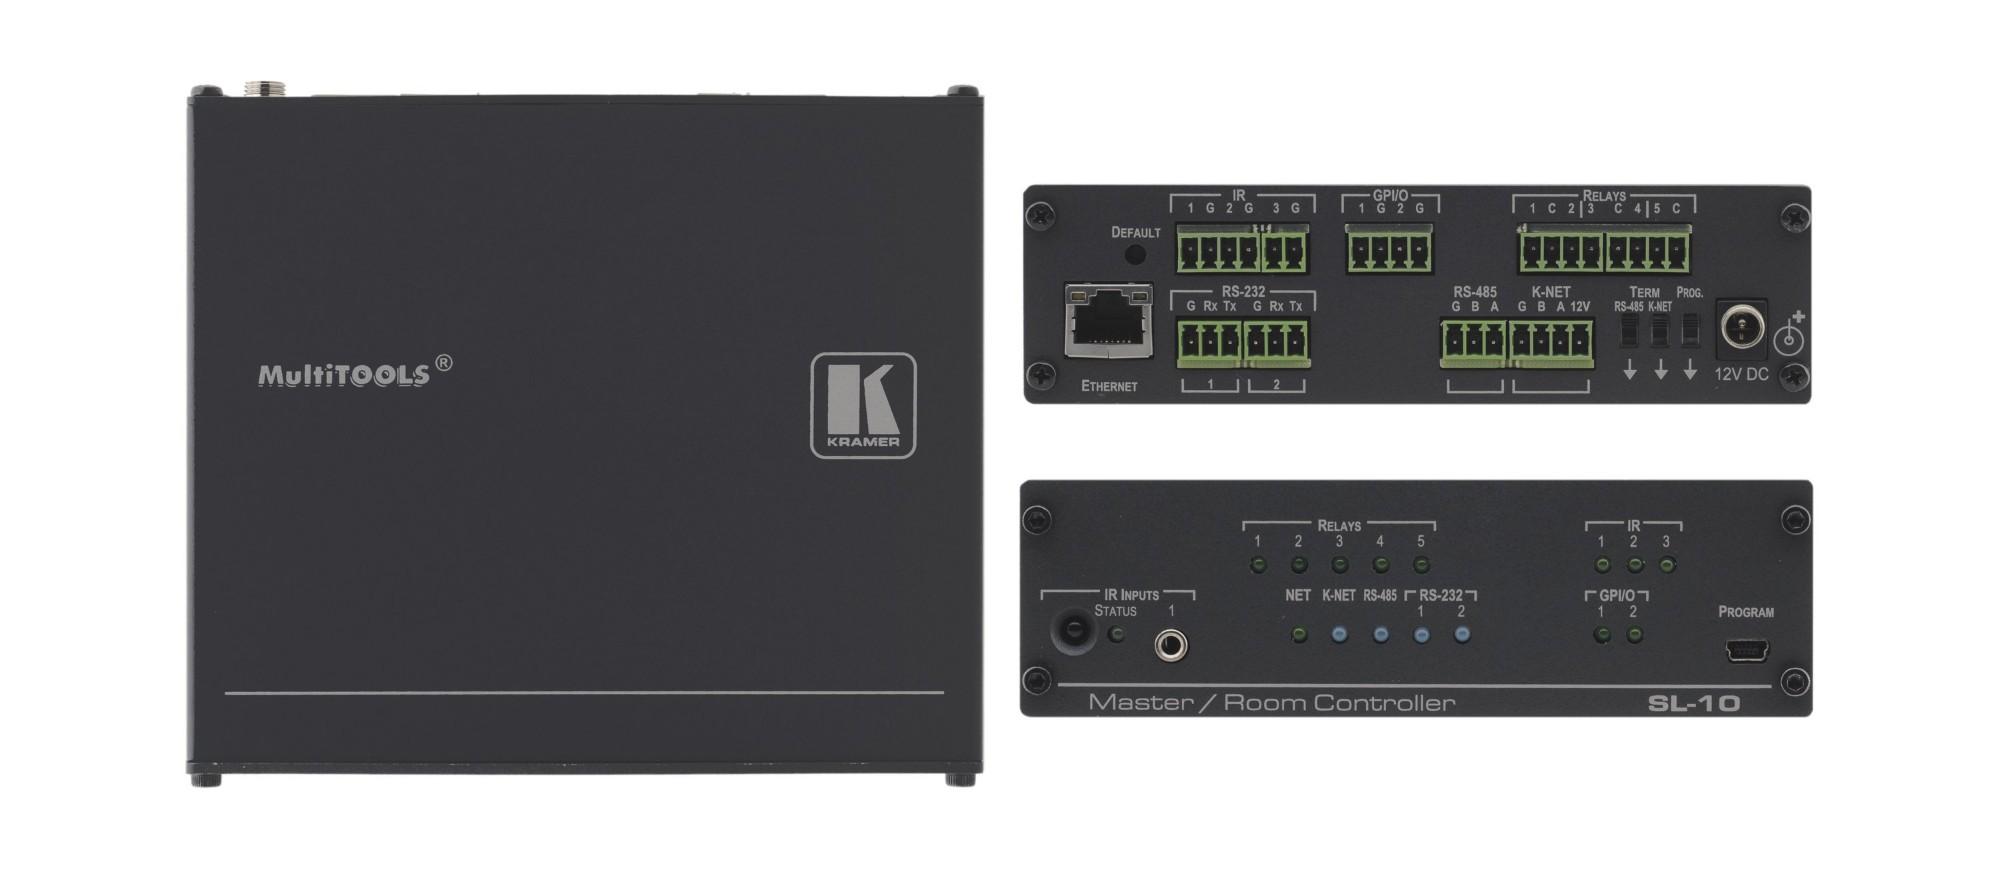 Kramer Electronics SL-10 Black multiroom audio controller